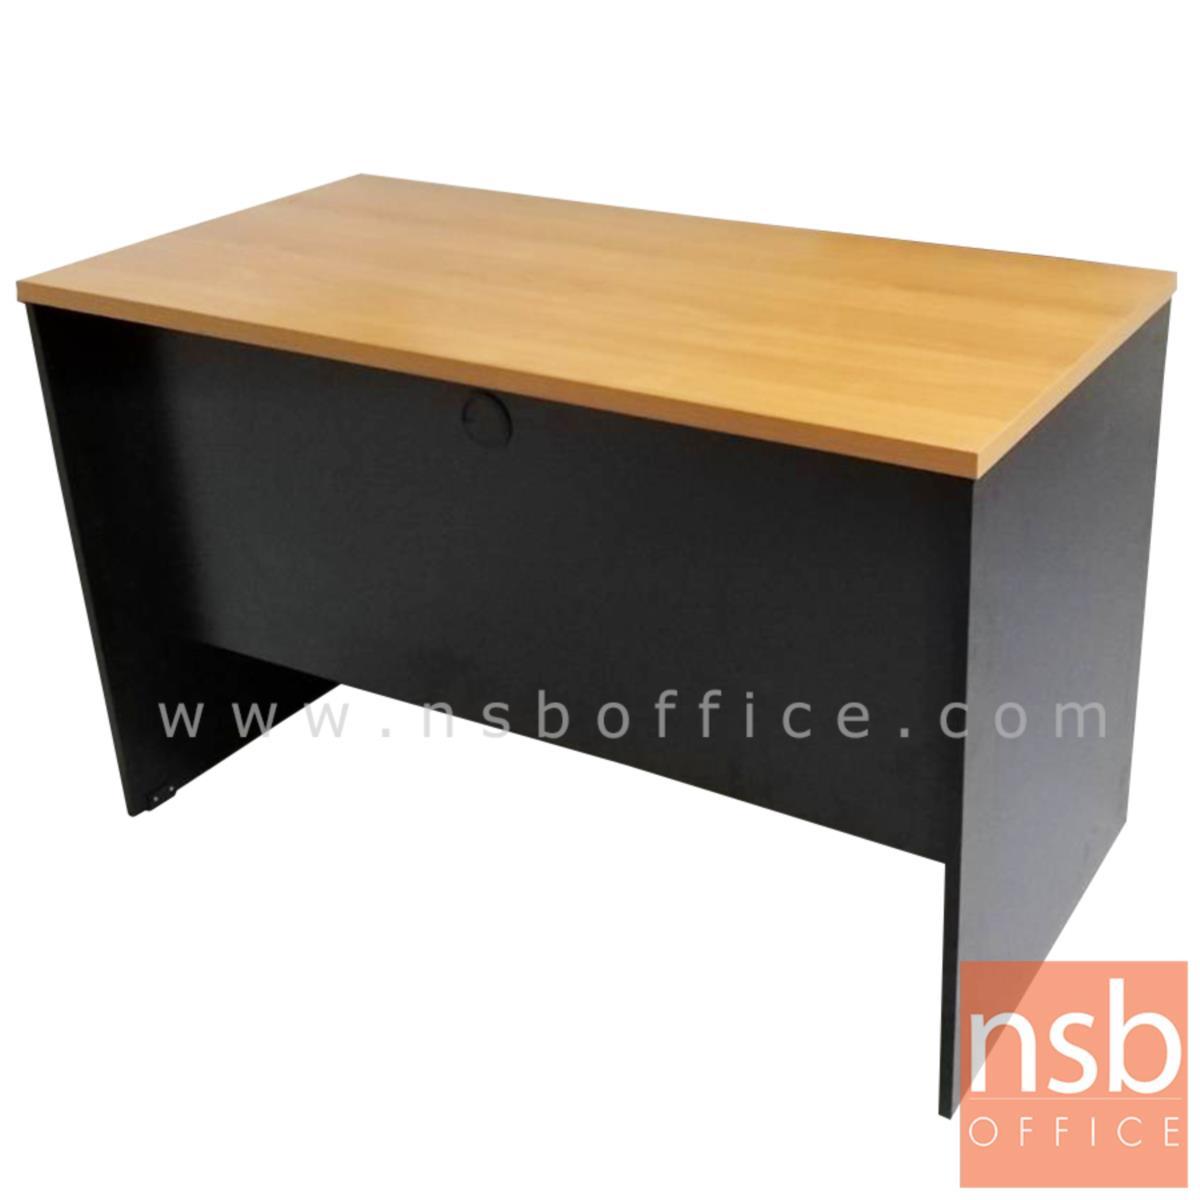 A12A018:โต๊ะทำงานโล่ง รุ่น Sledge (สเลดจ์) ขนาด 80W ,120W ,150W (60D ,75D) cm.  เมลามีน